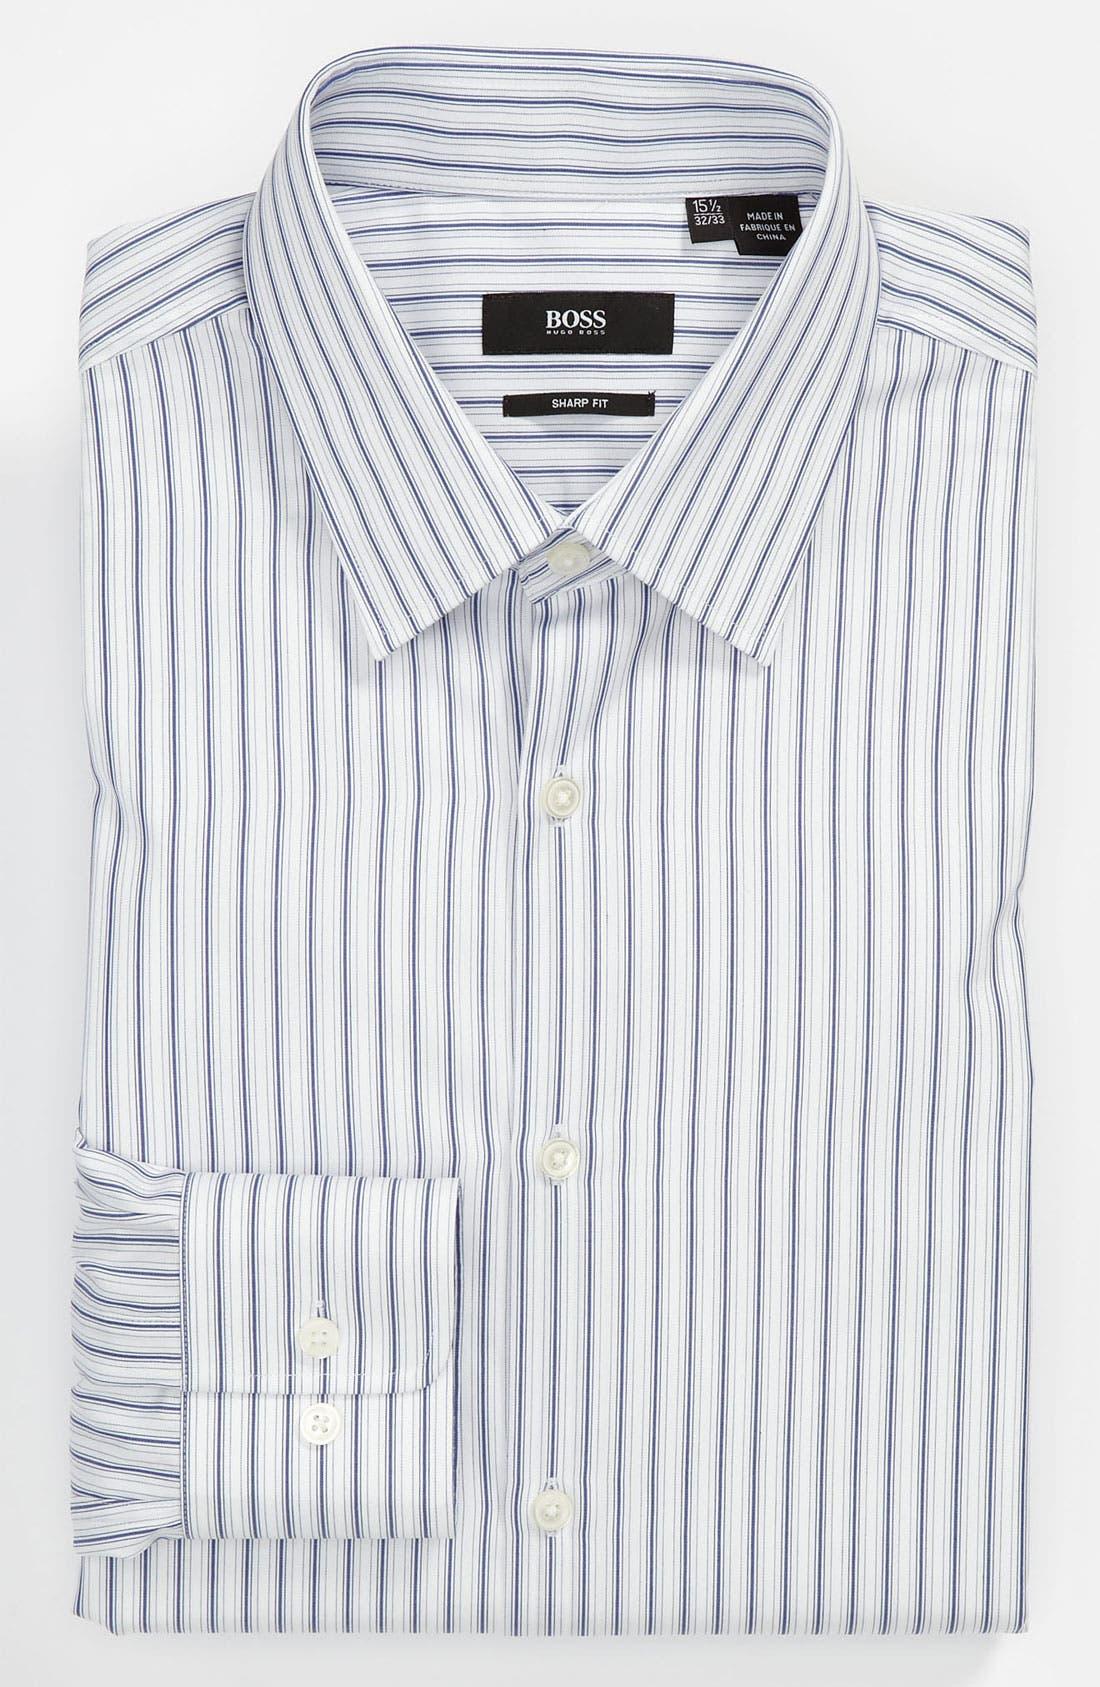 Main Image - BOSS Black Sharp Fit Dress Shirt